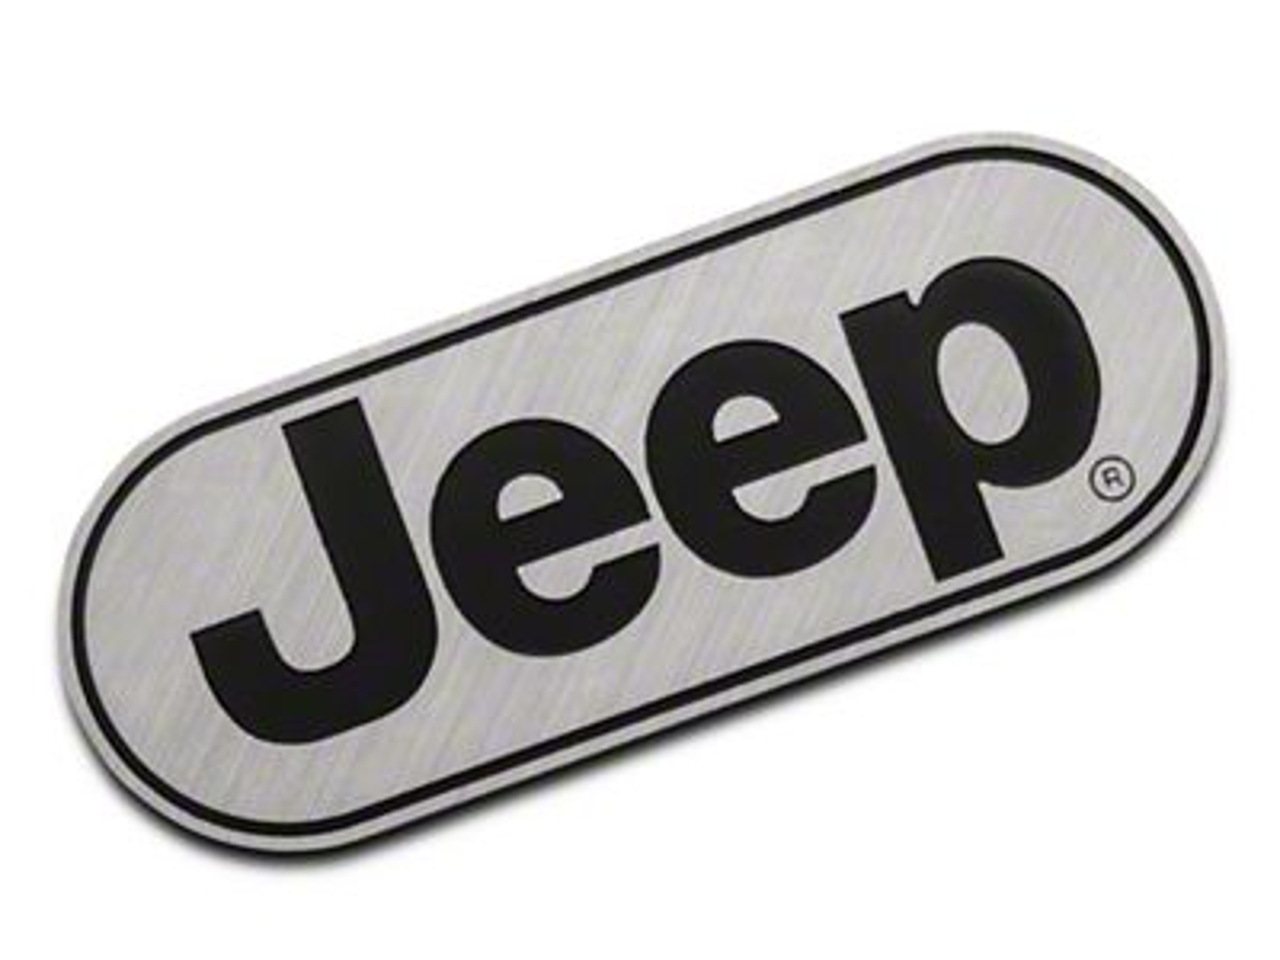 RedRock 4x4 Jeep Logo Hitch Cover (87-18 Jeep Wrangler YJ, TJ, JK & JL)